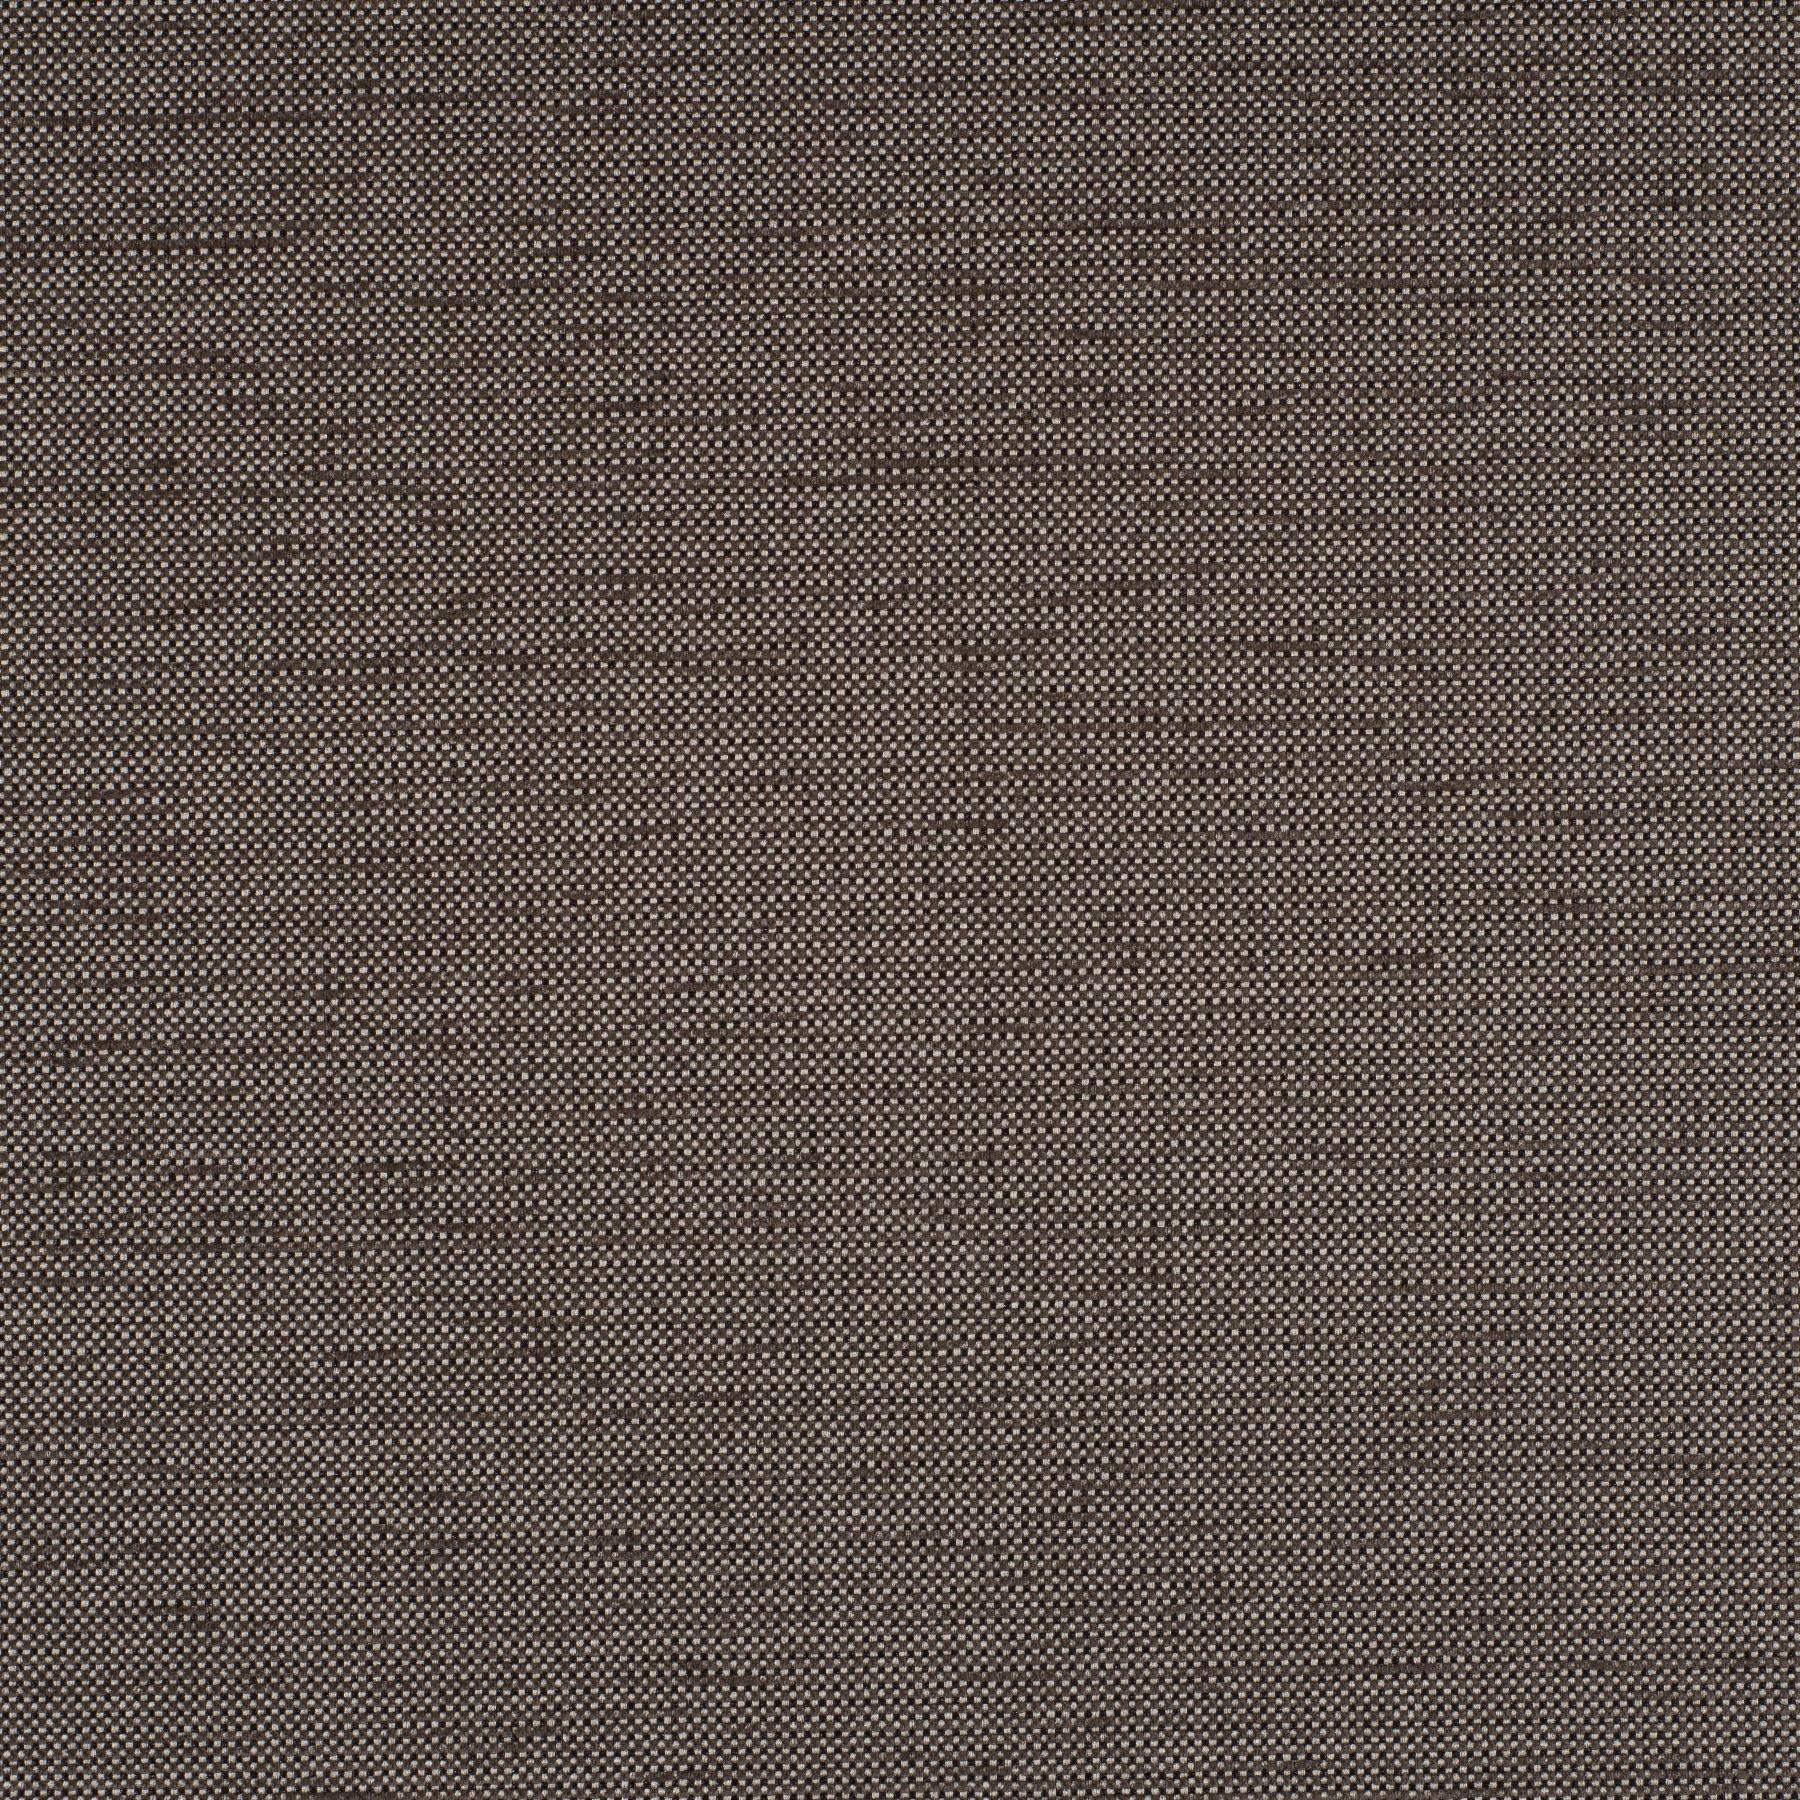 upholstery fabric rondo 1 1196 092 jab anstoetz fabrics. Black Bedroom Furniture Sets. Home Design Ideas